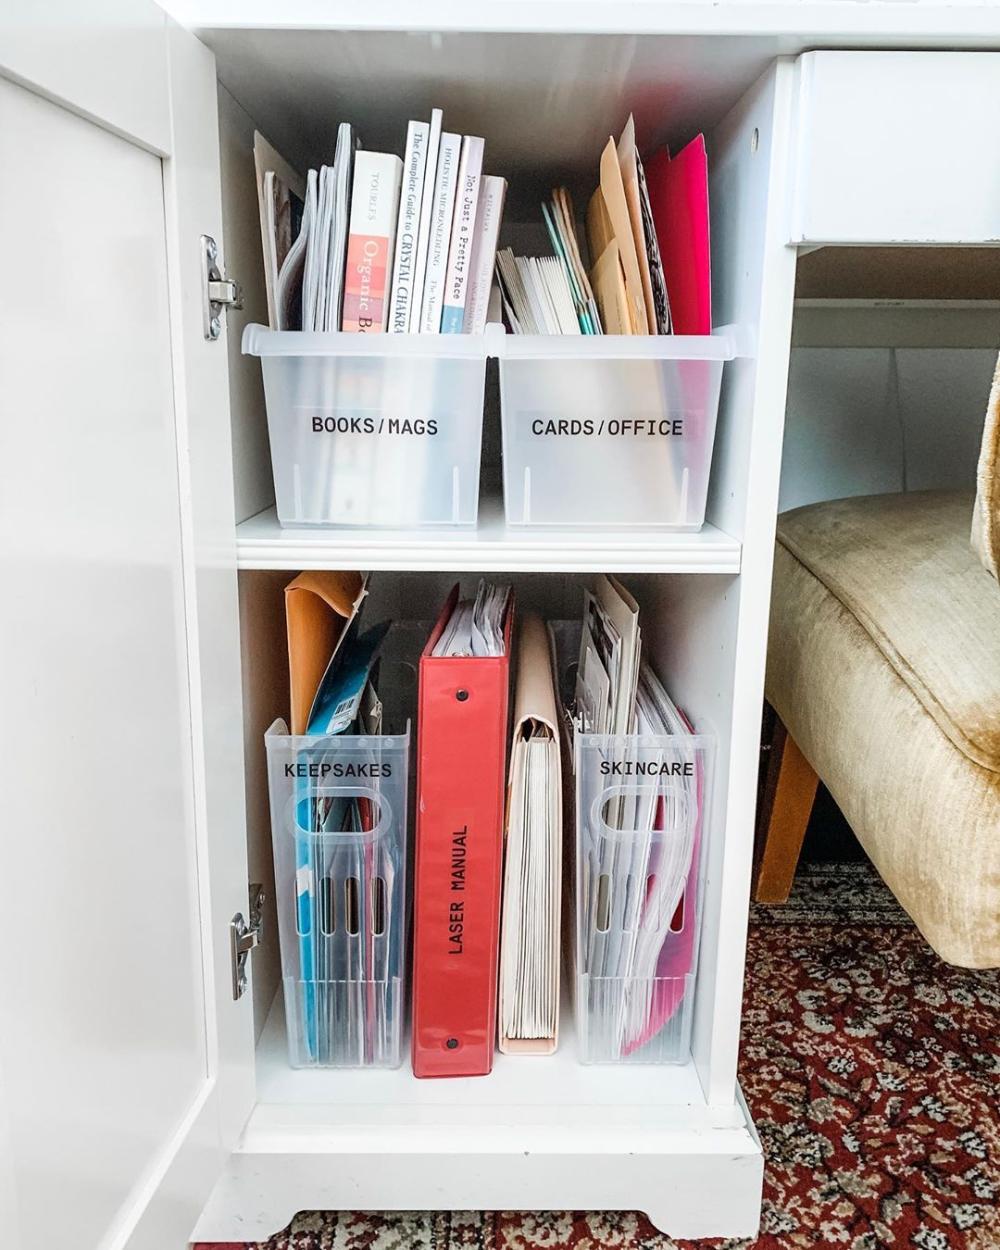 6 Dorm Room Desk Organization Ideas You'll Love - SavvyCollegeGirl -   19 diy Organization desk ideas